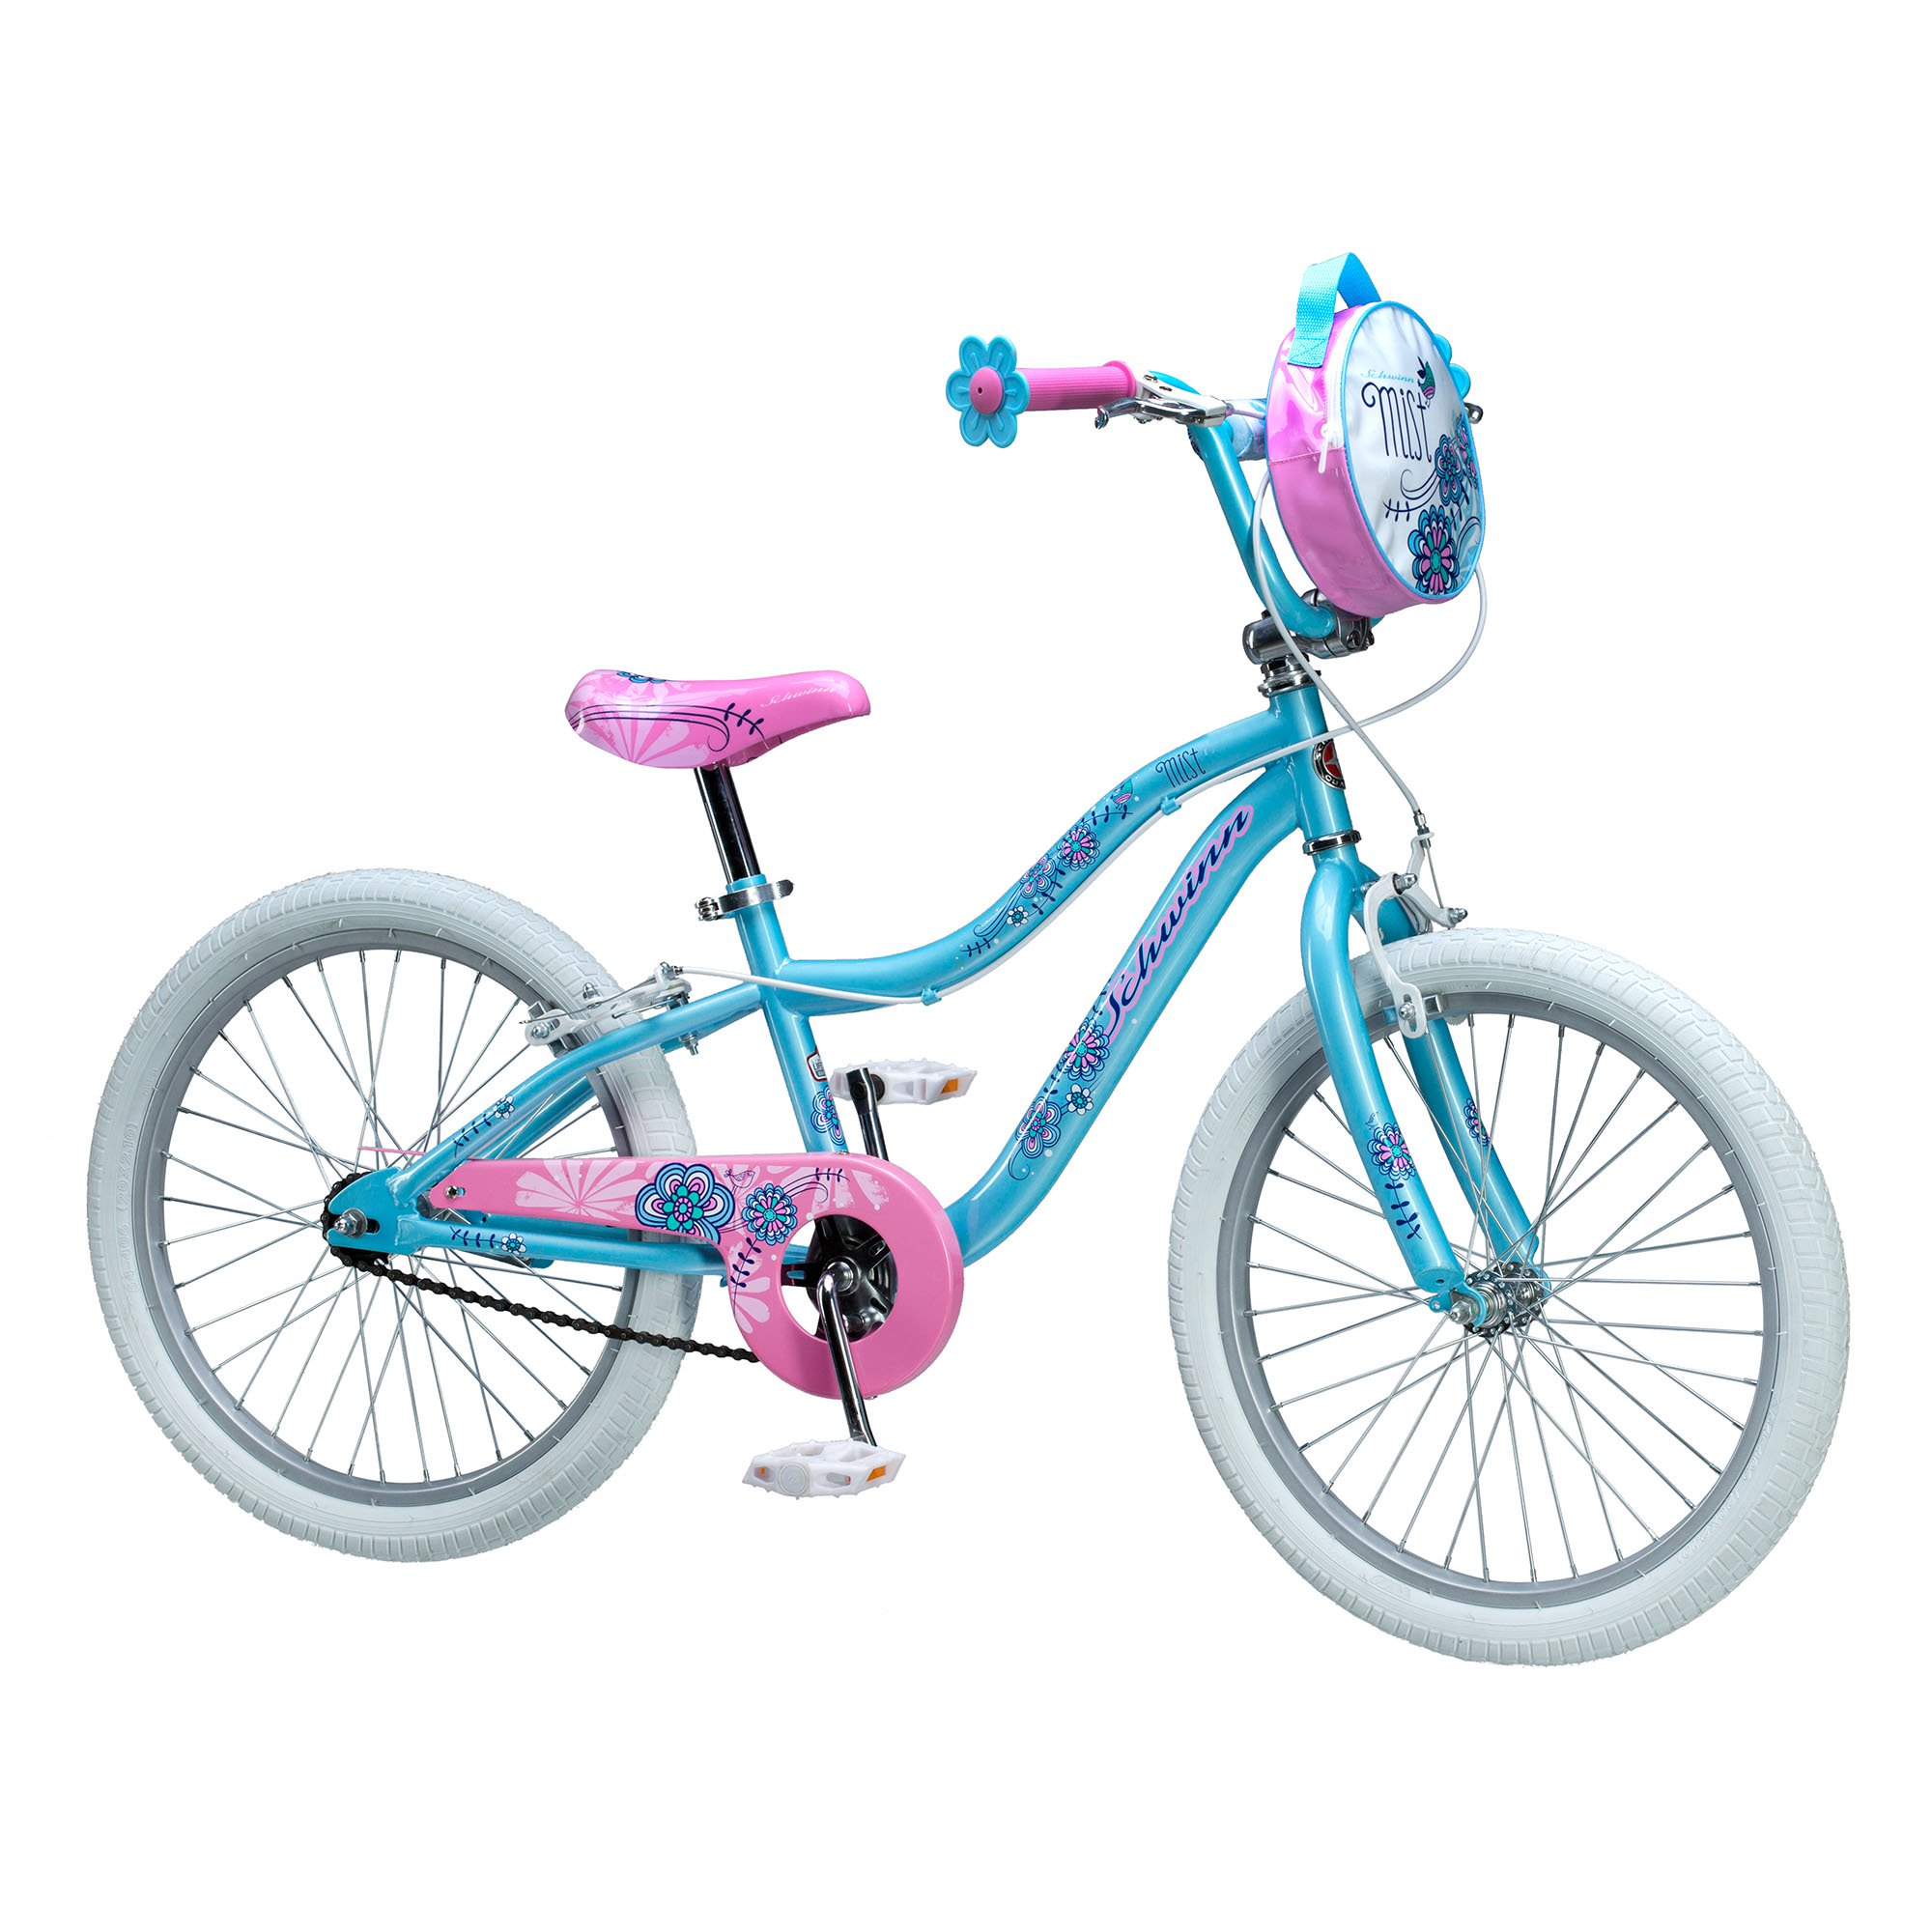 "Schwinn SmartStart Mist 20"" Steel Frame Hand Brake Kids Sidewalk Bicycle, Blue by Schwinn"